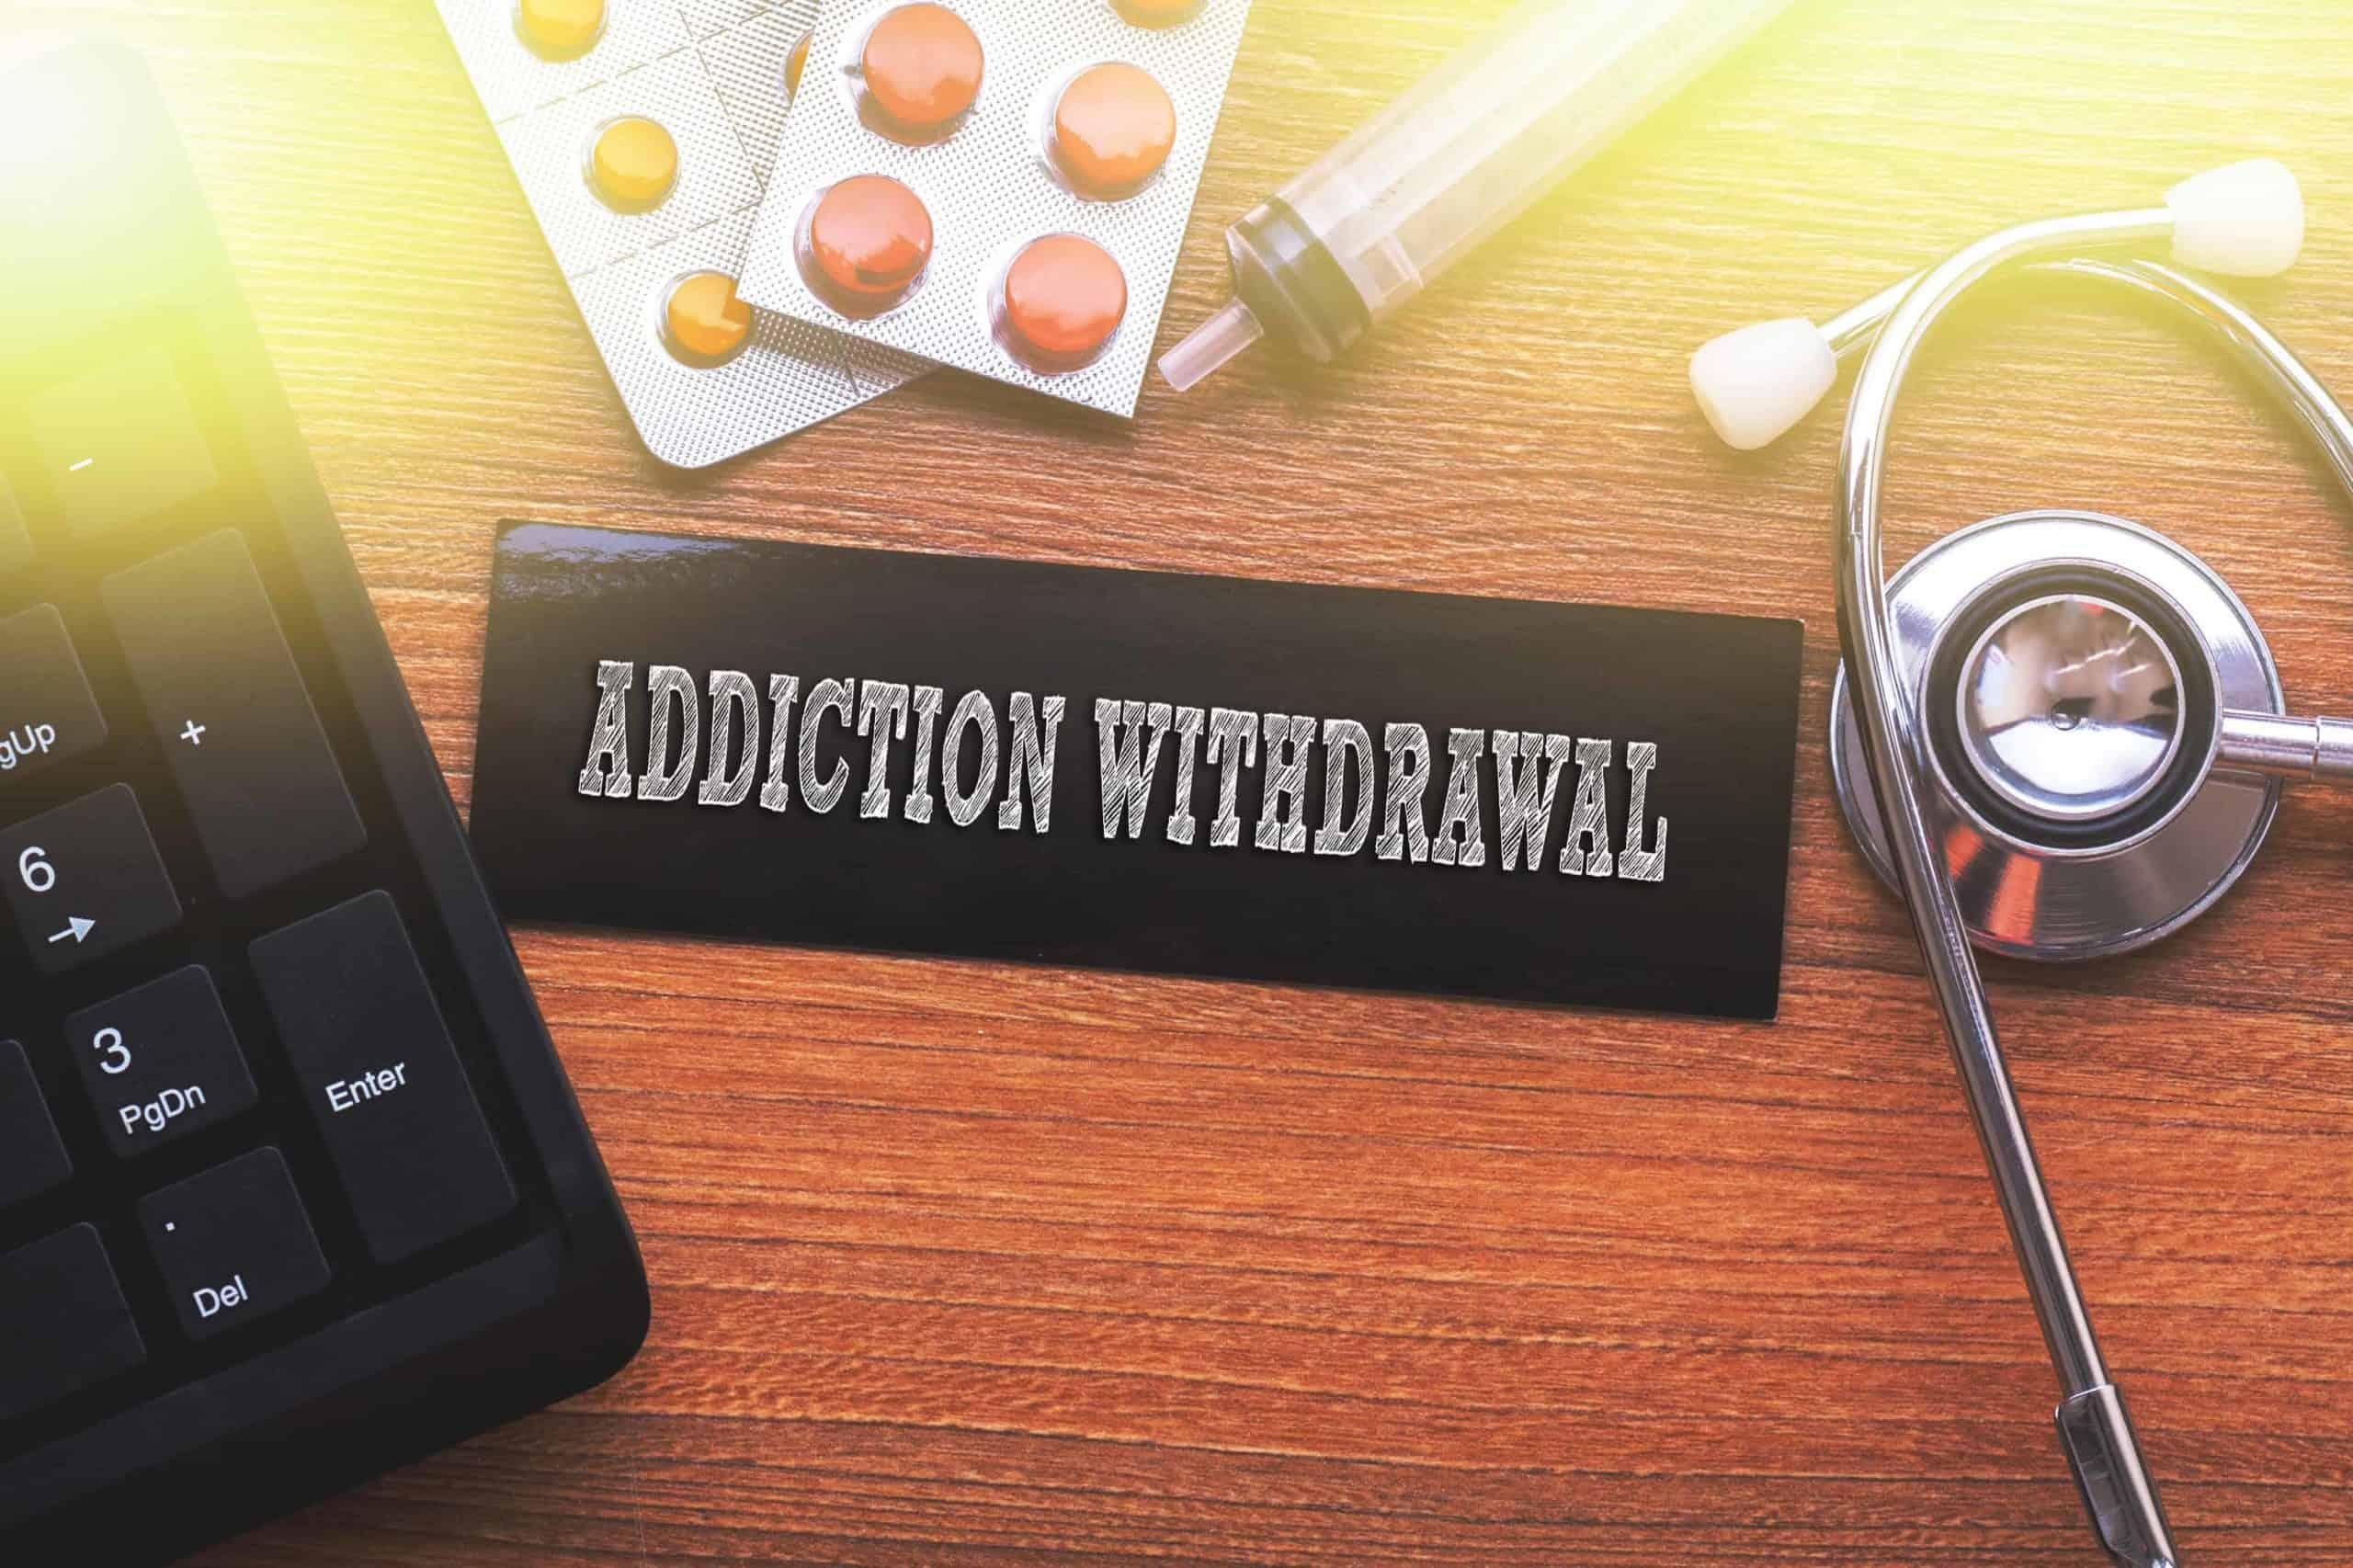 Tips for Managing Withdrawal Symptoms